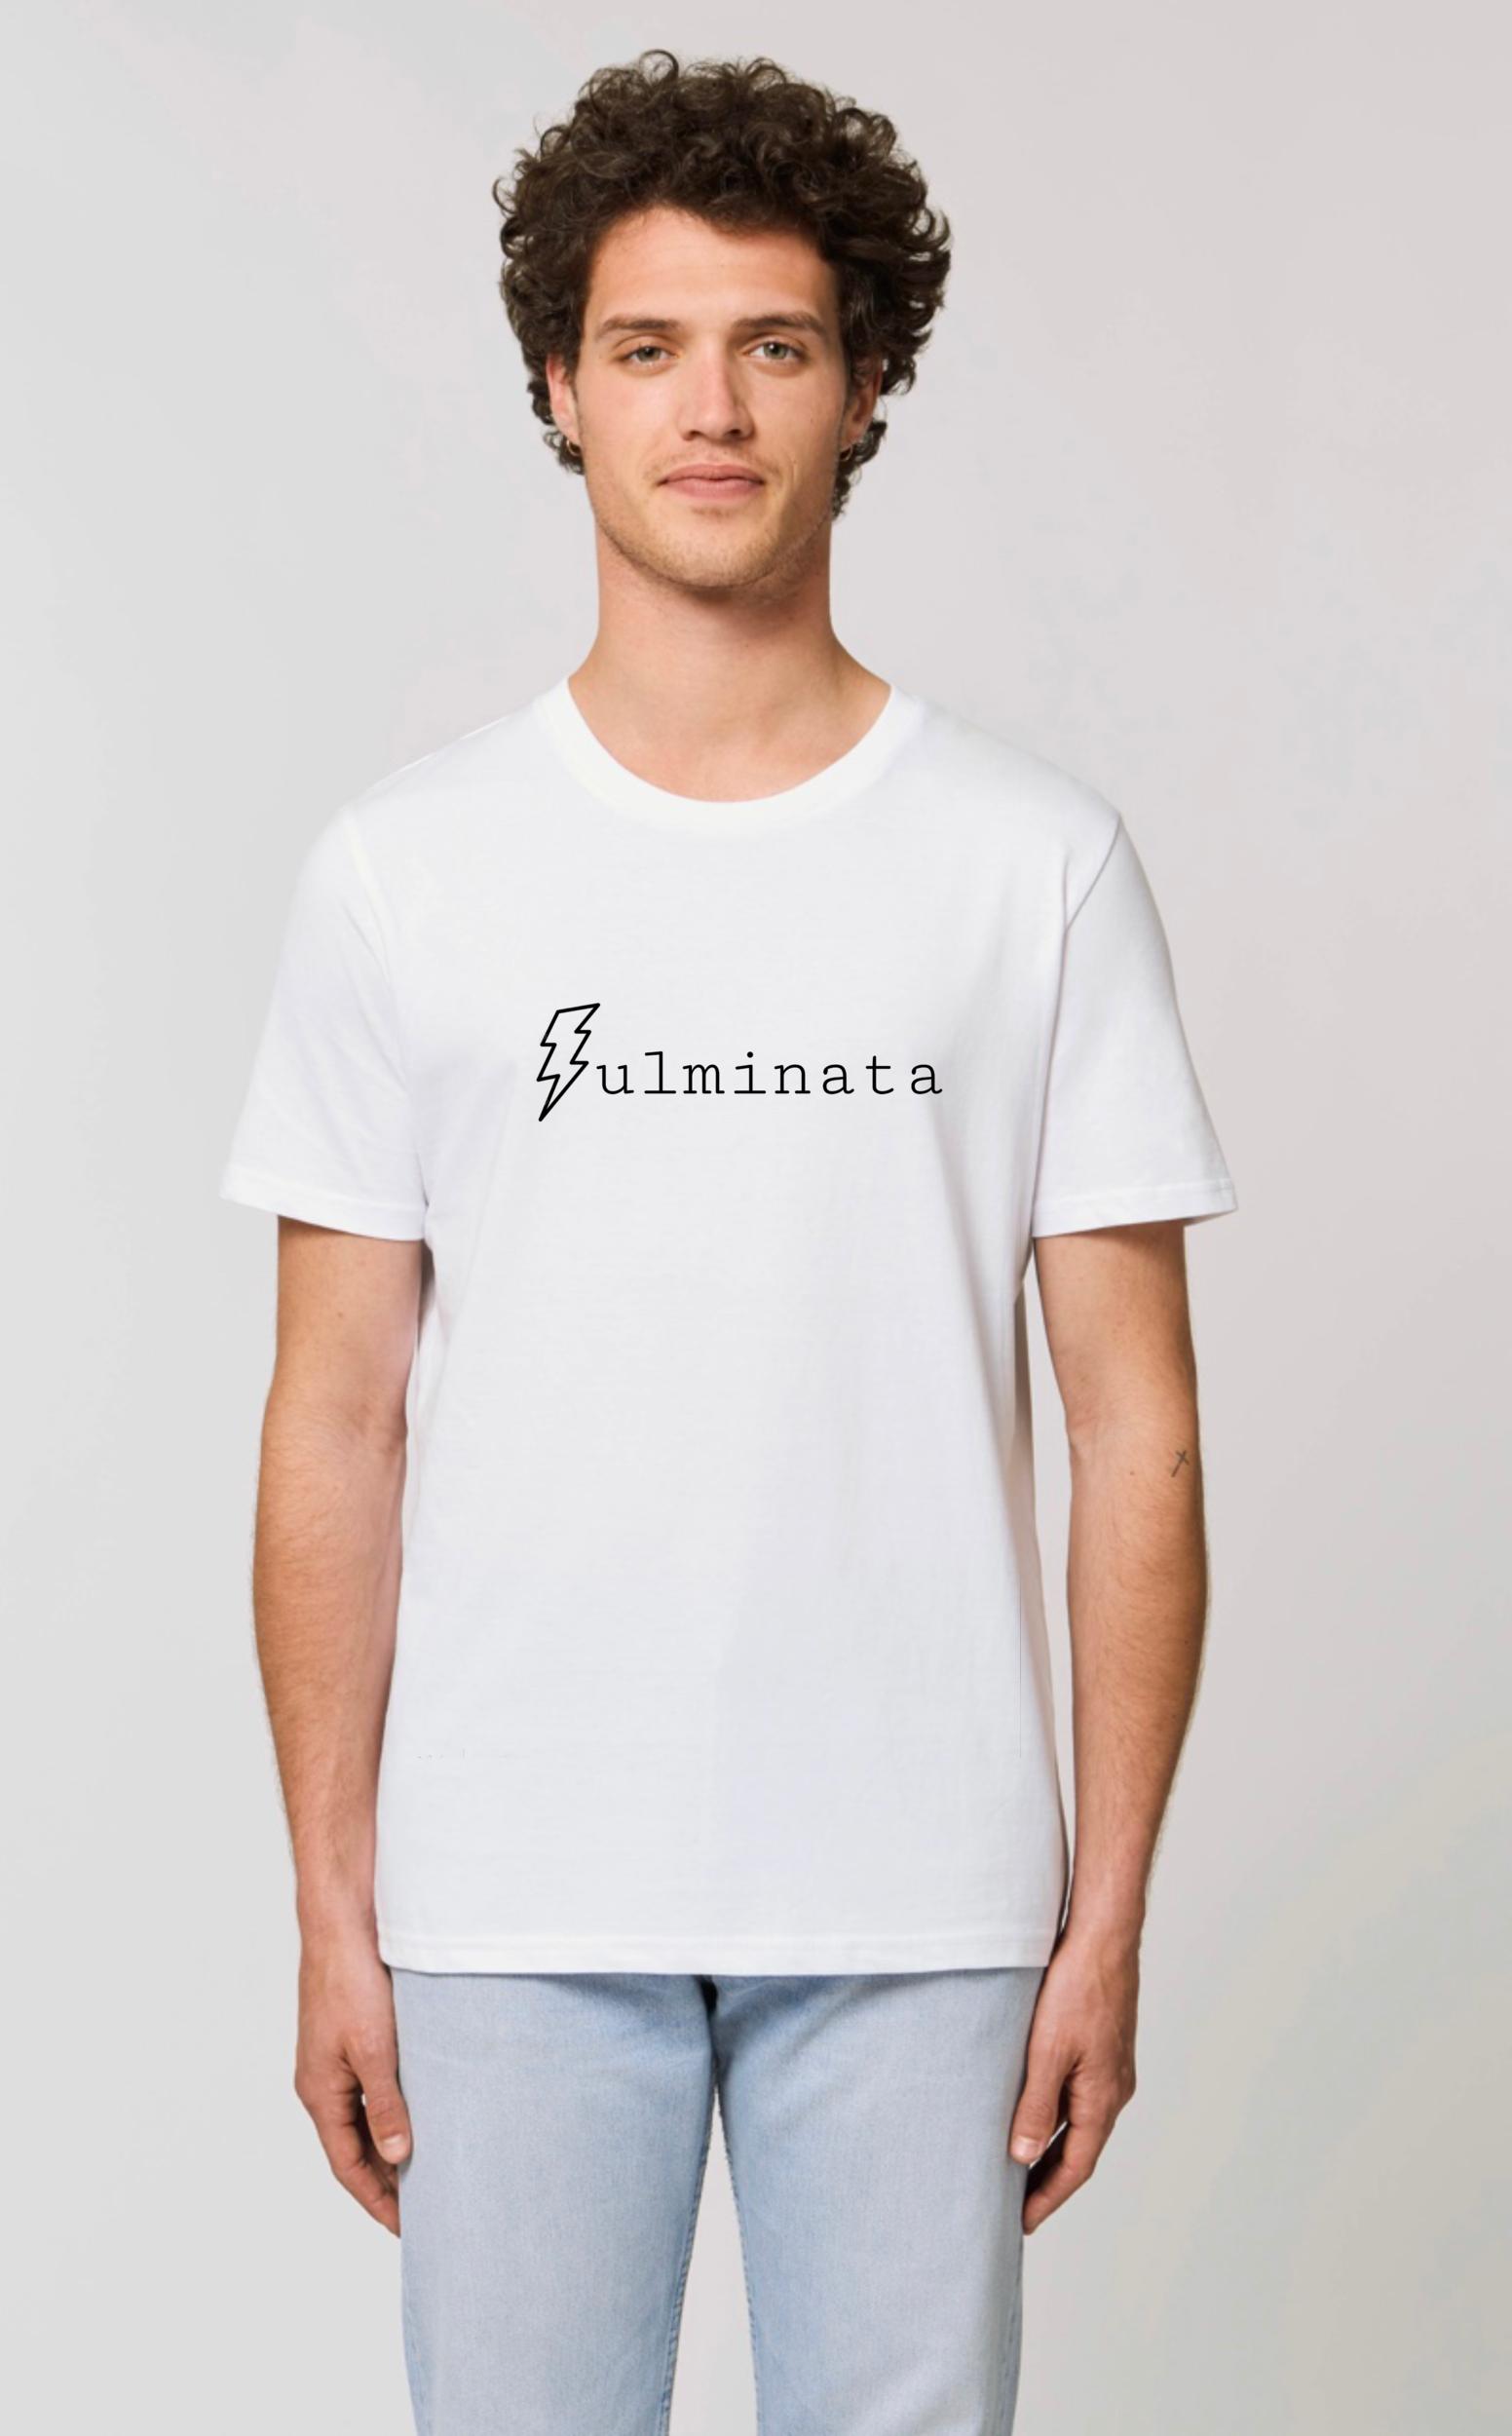 FULMINATA